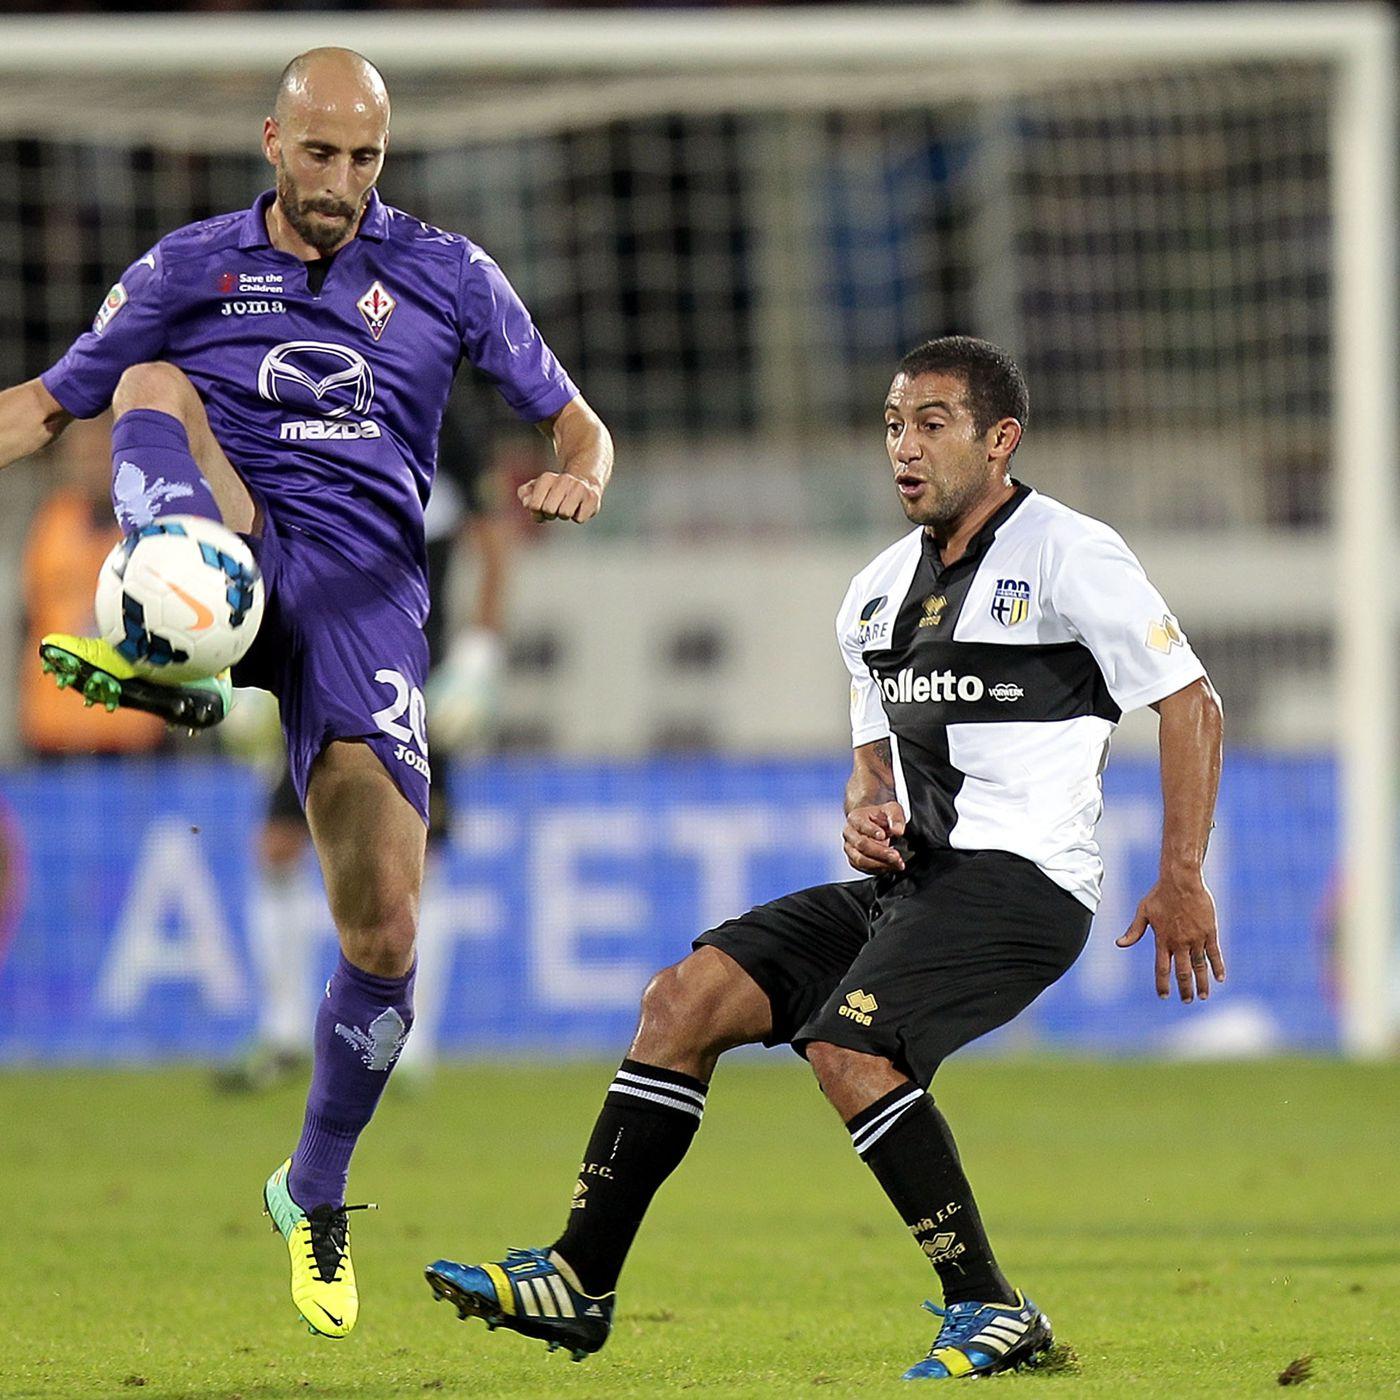 Fiorentina parma betting preview nfl betting gods cs go ranking